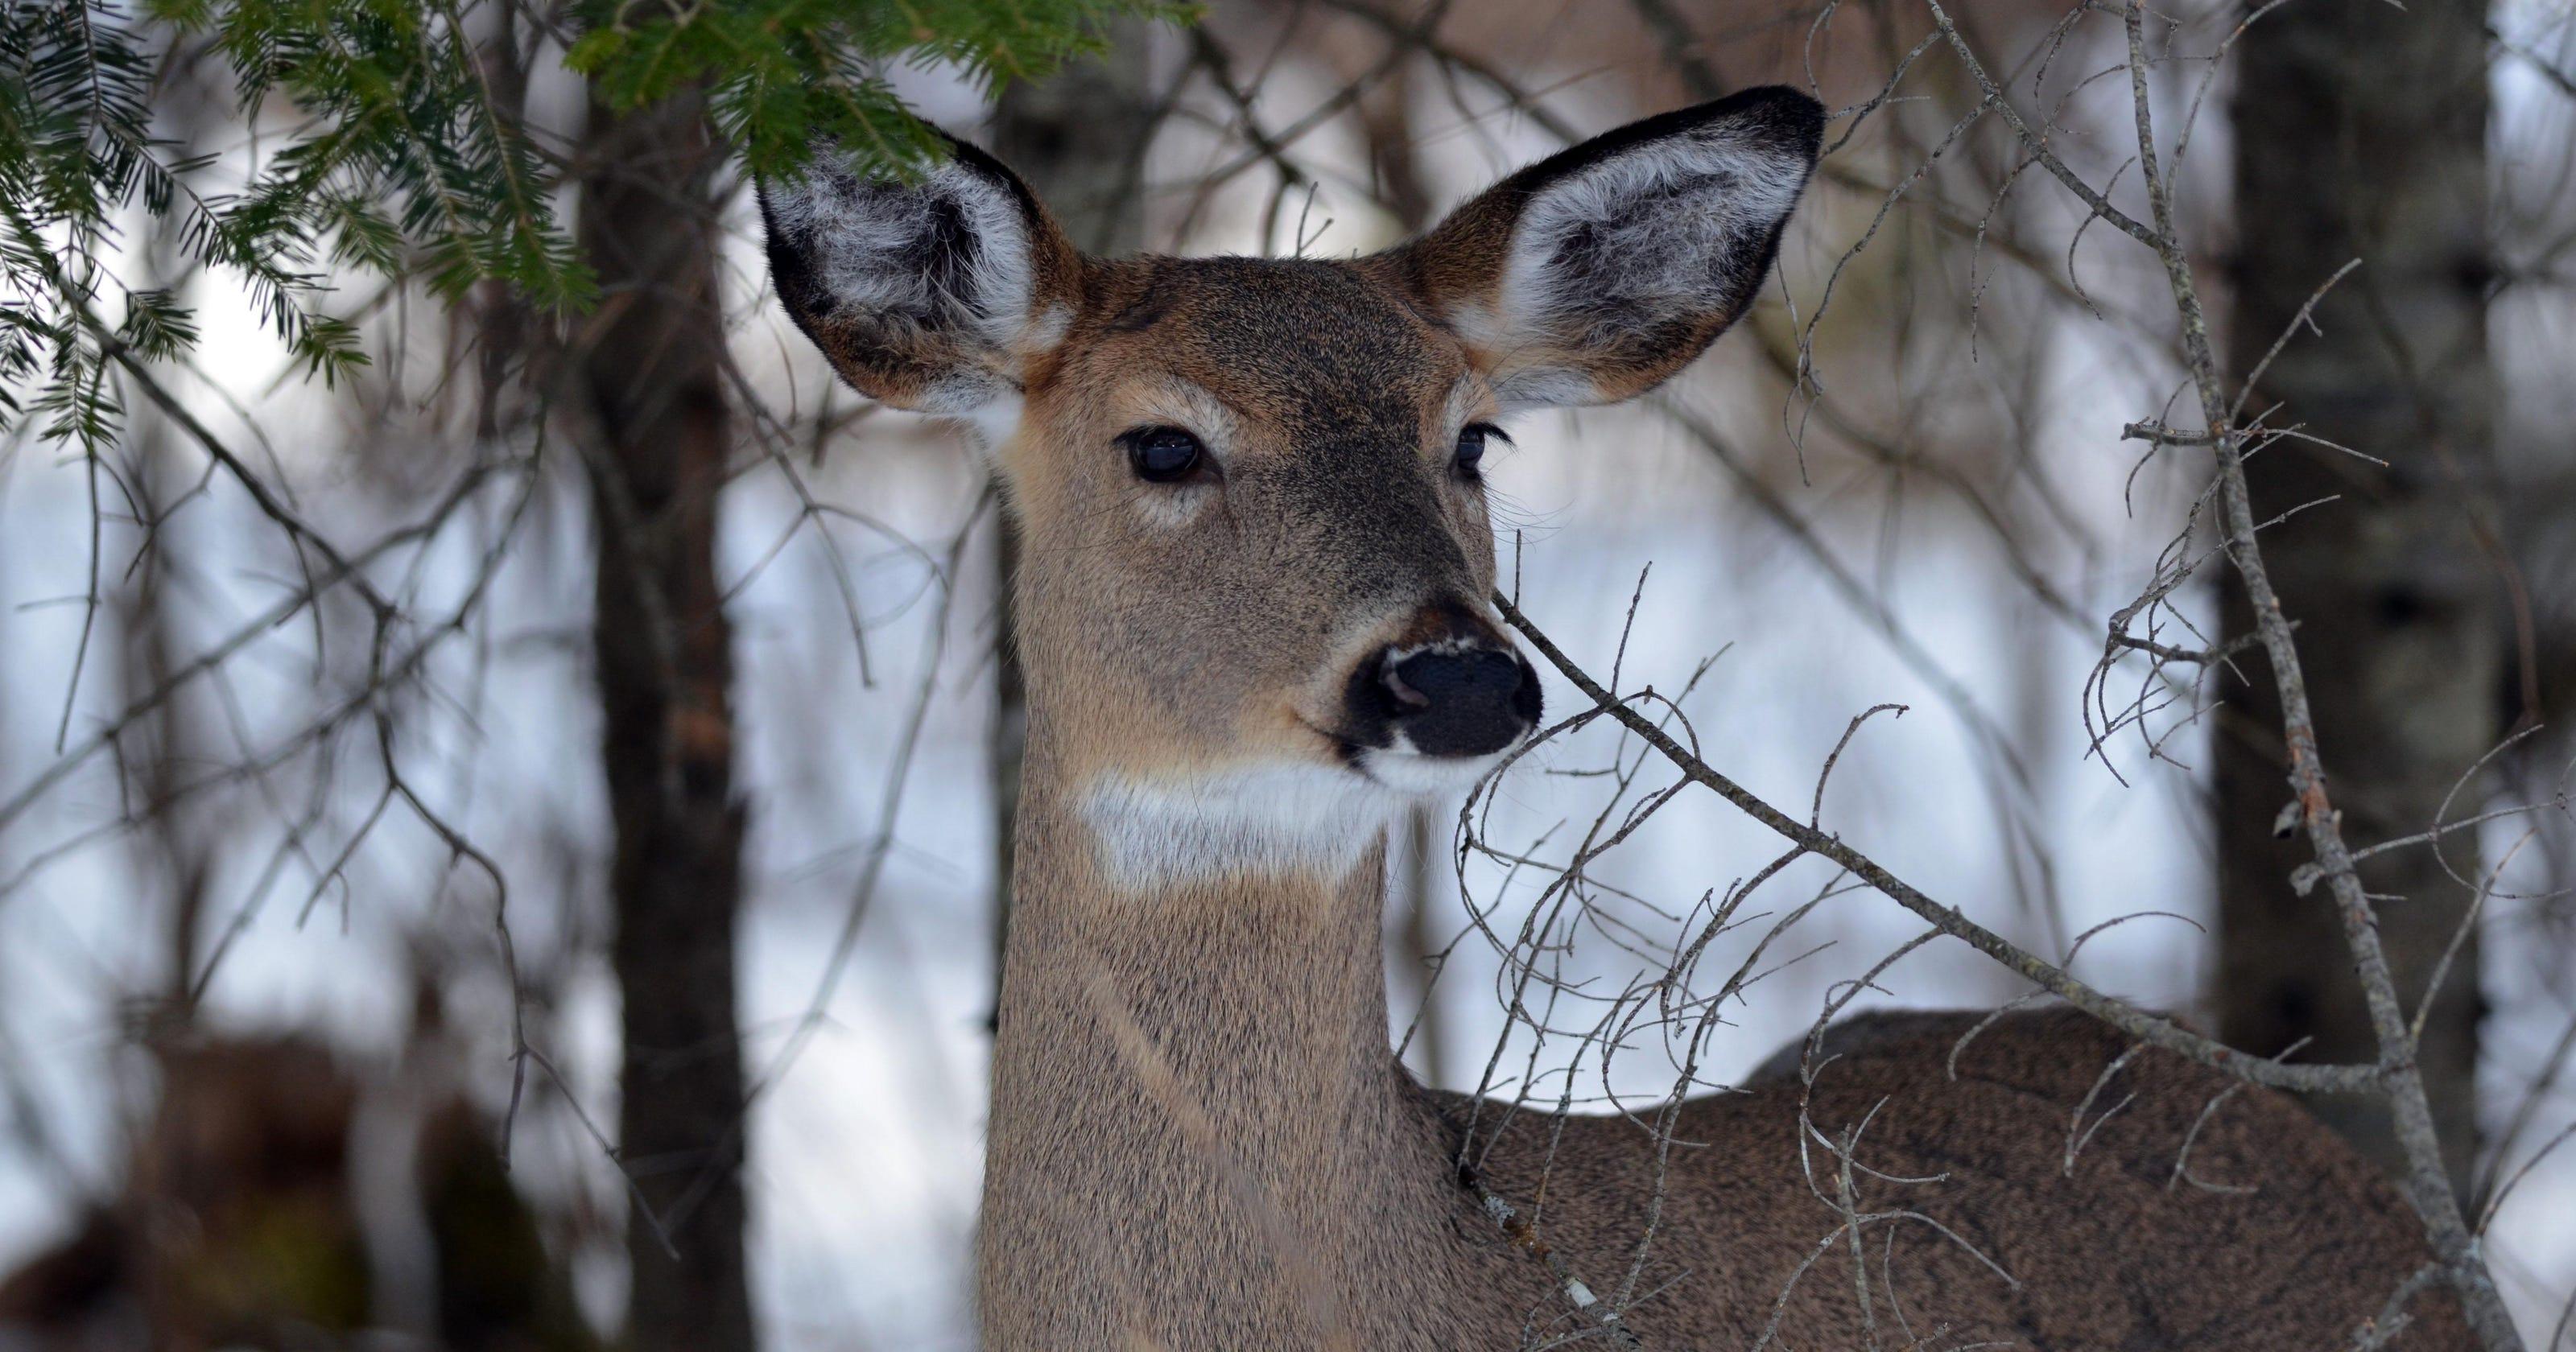 Winter is far from over for Upper Peninsula deer